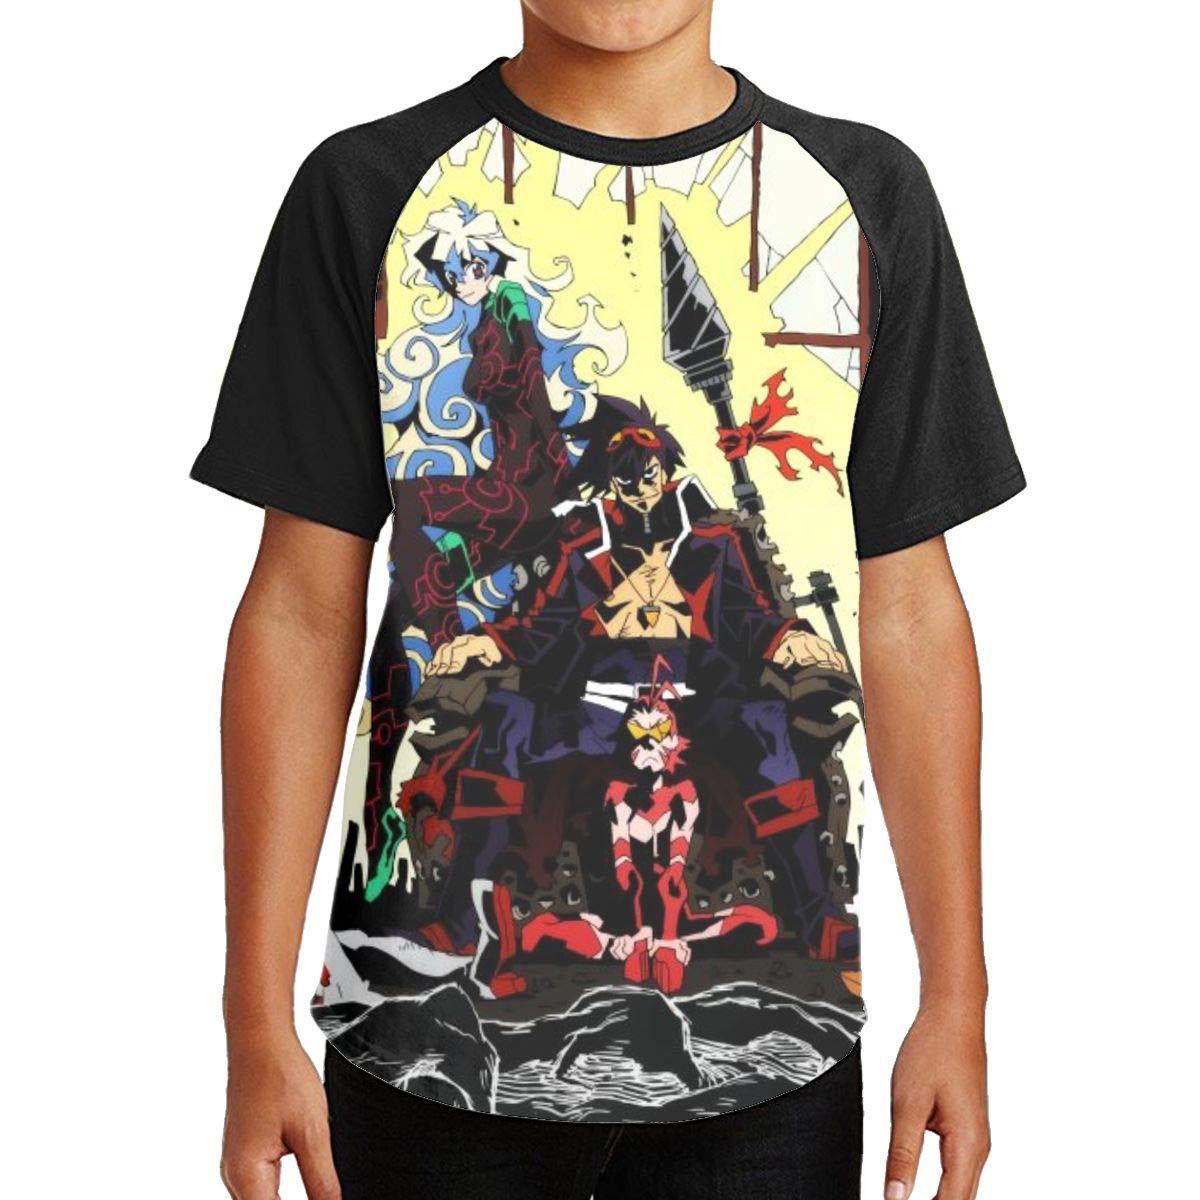 KkdsKkds Gurren Lagann Youth Tee Shirt Tshirt for Girls Boys Round Neck Short Sleeve